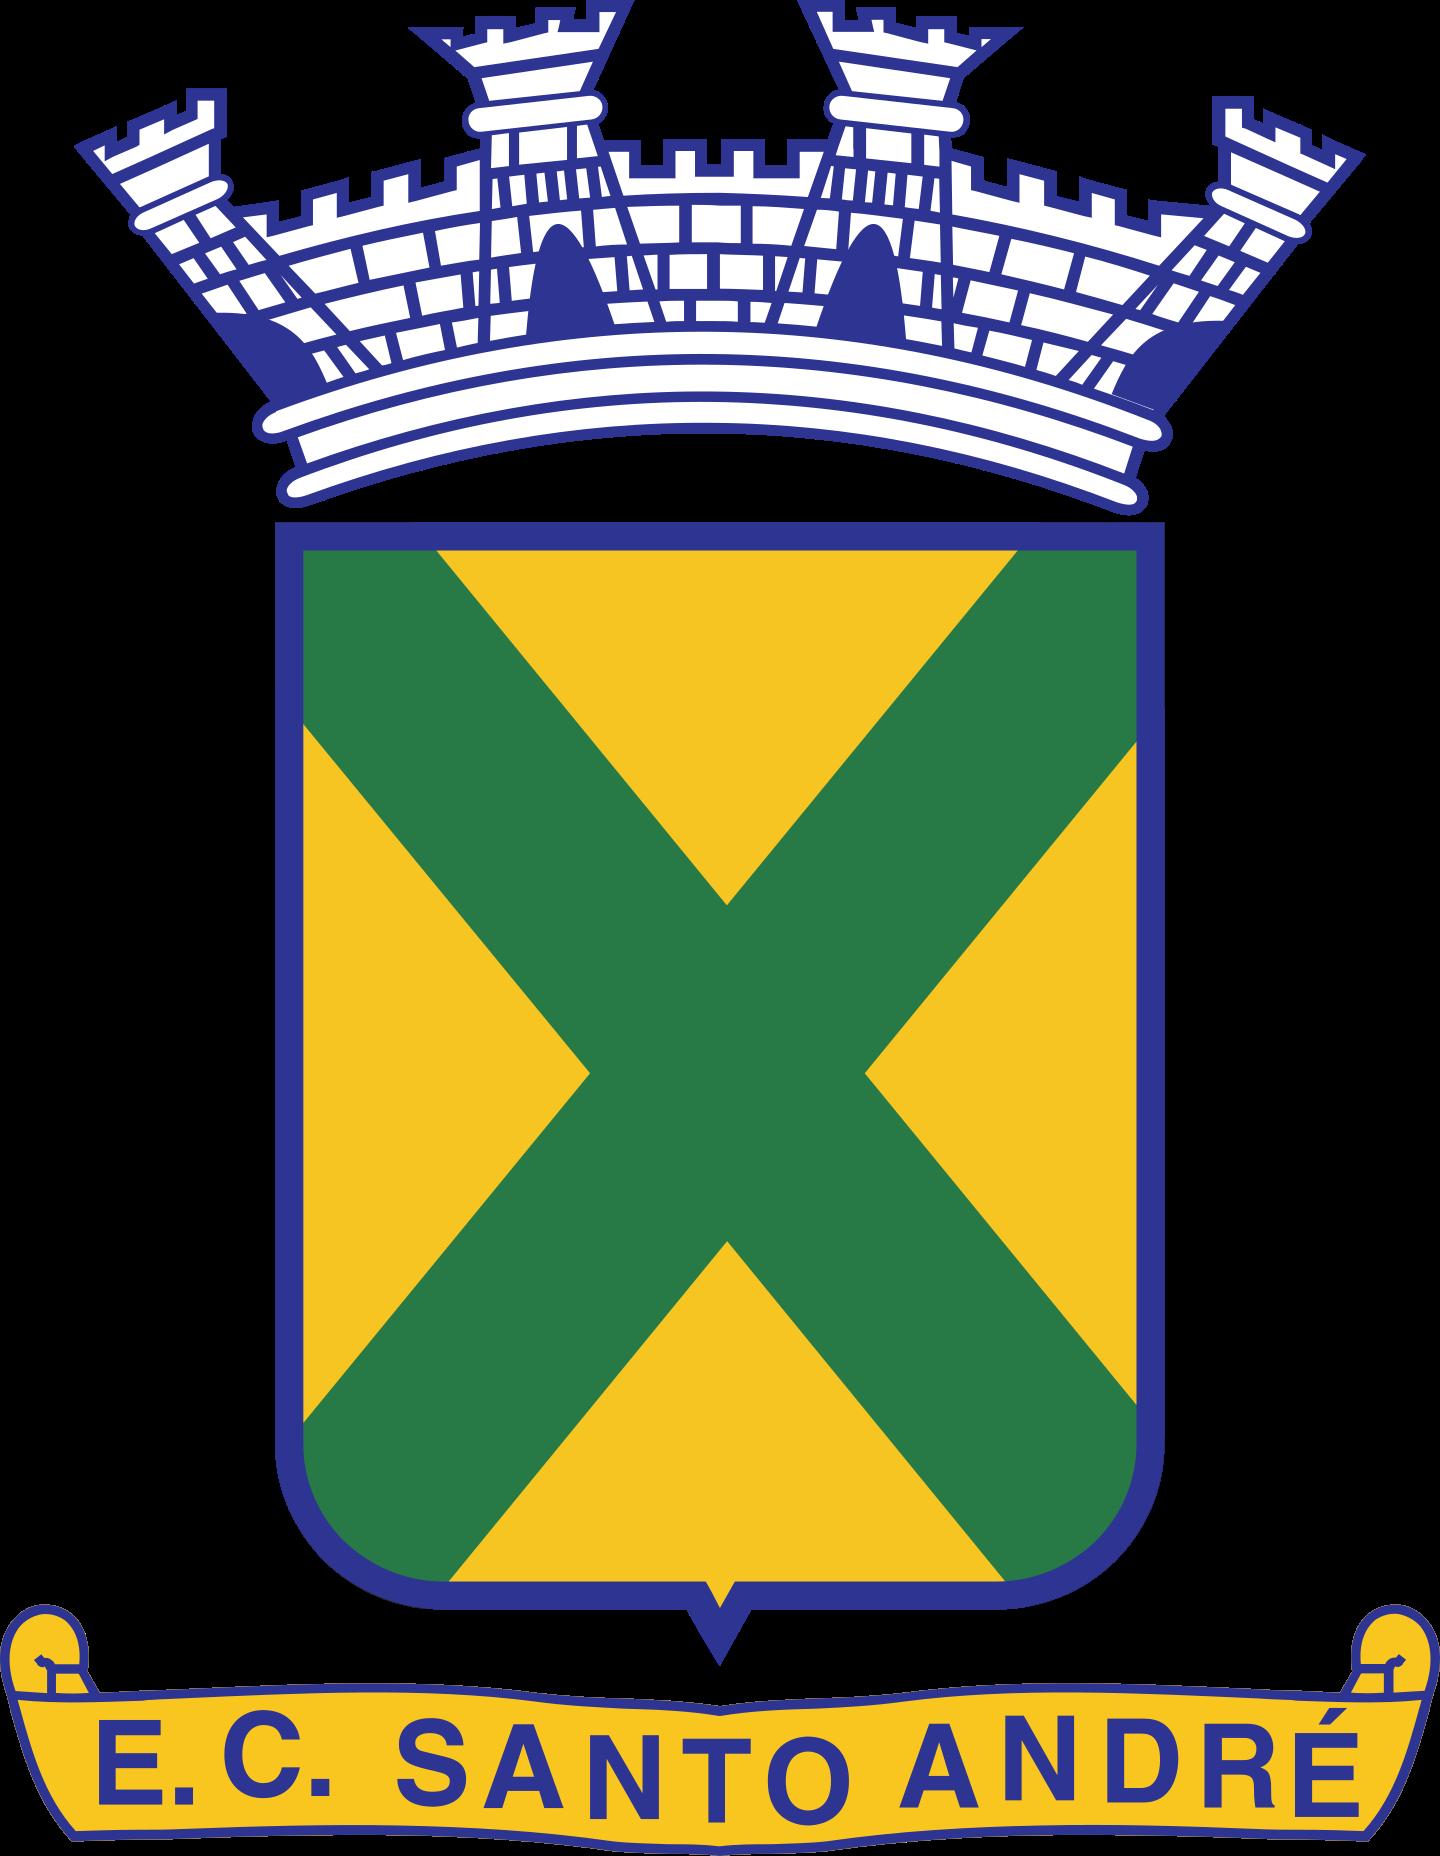 ec santo andre logo 2 - EC Santo André Logo